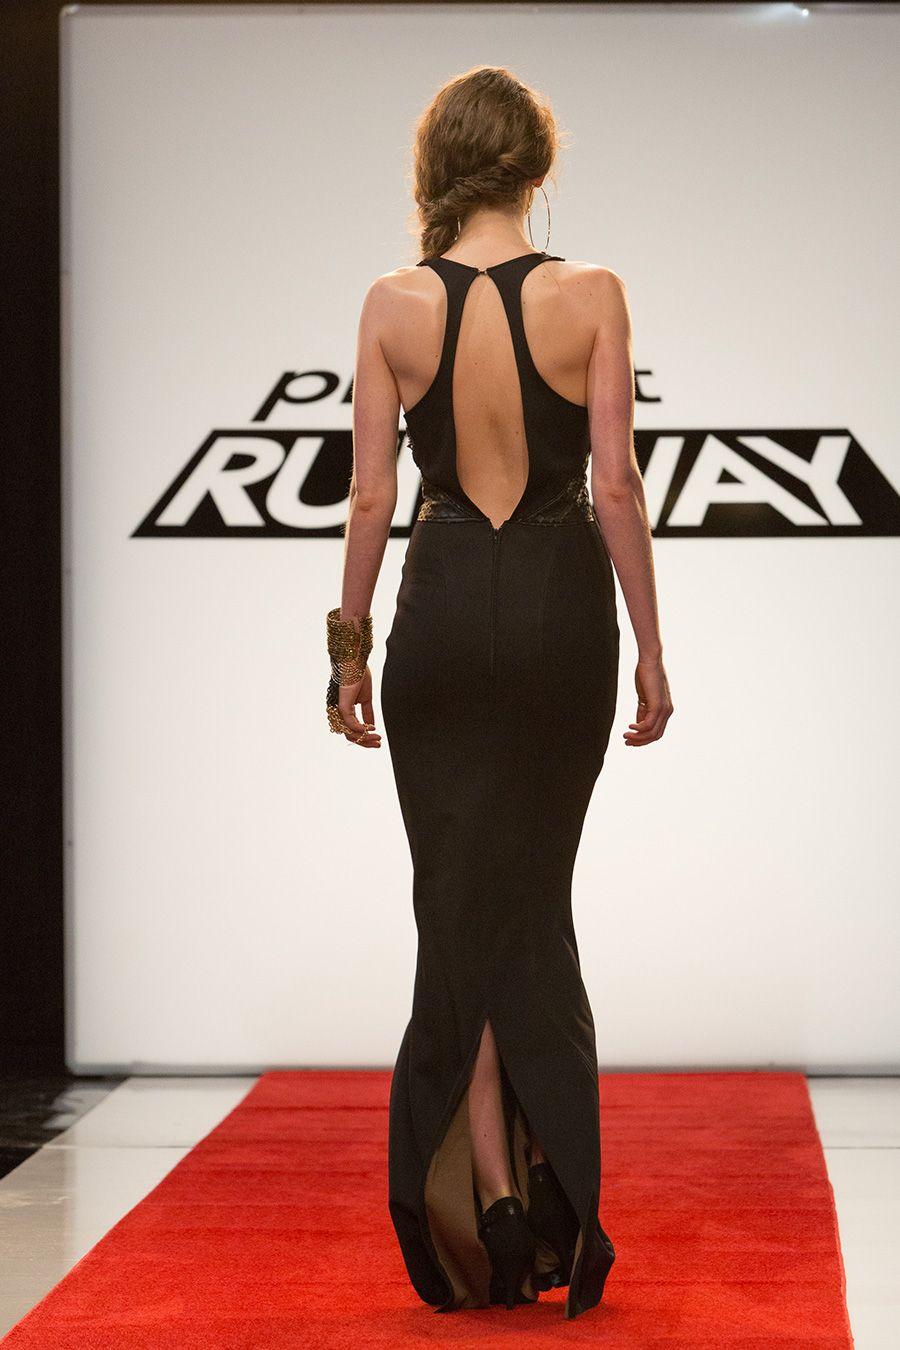 Amanda Valentine Project Runway Season 13 Episode 5 Look :